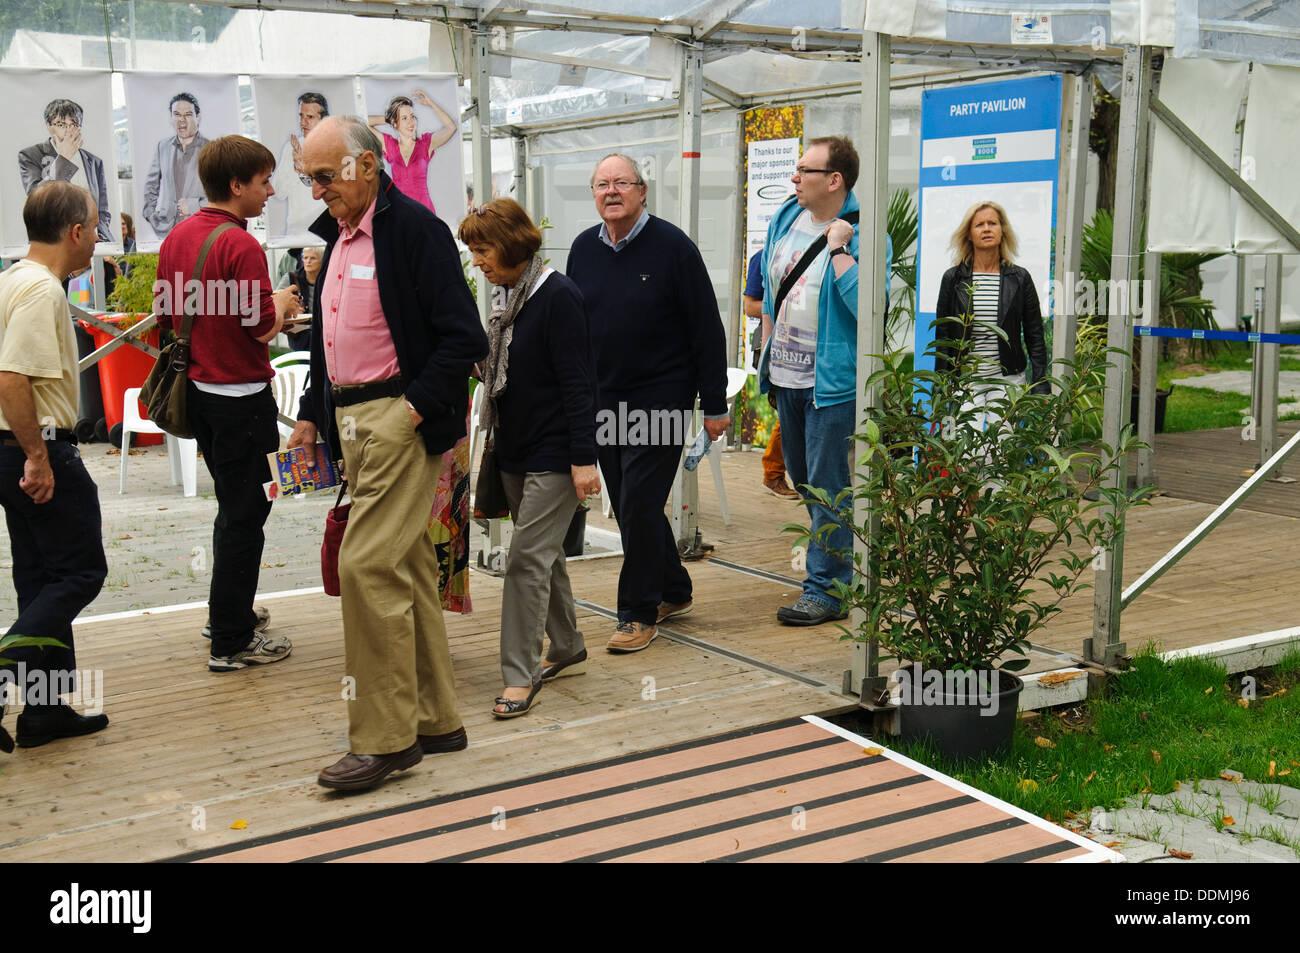 Queues at the Edinburgh International Book Festival. - Stock Image